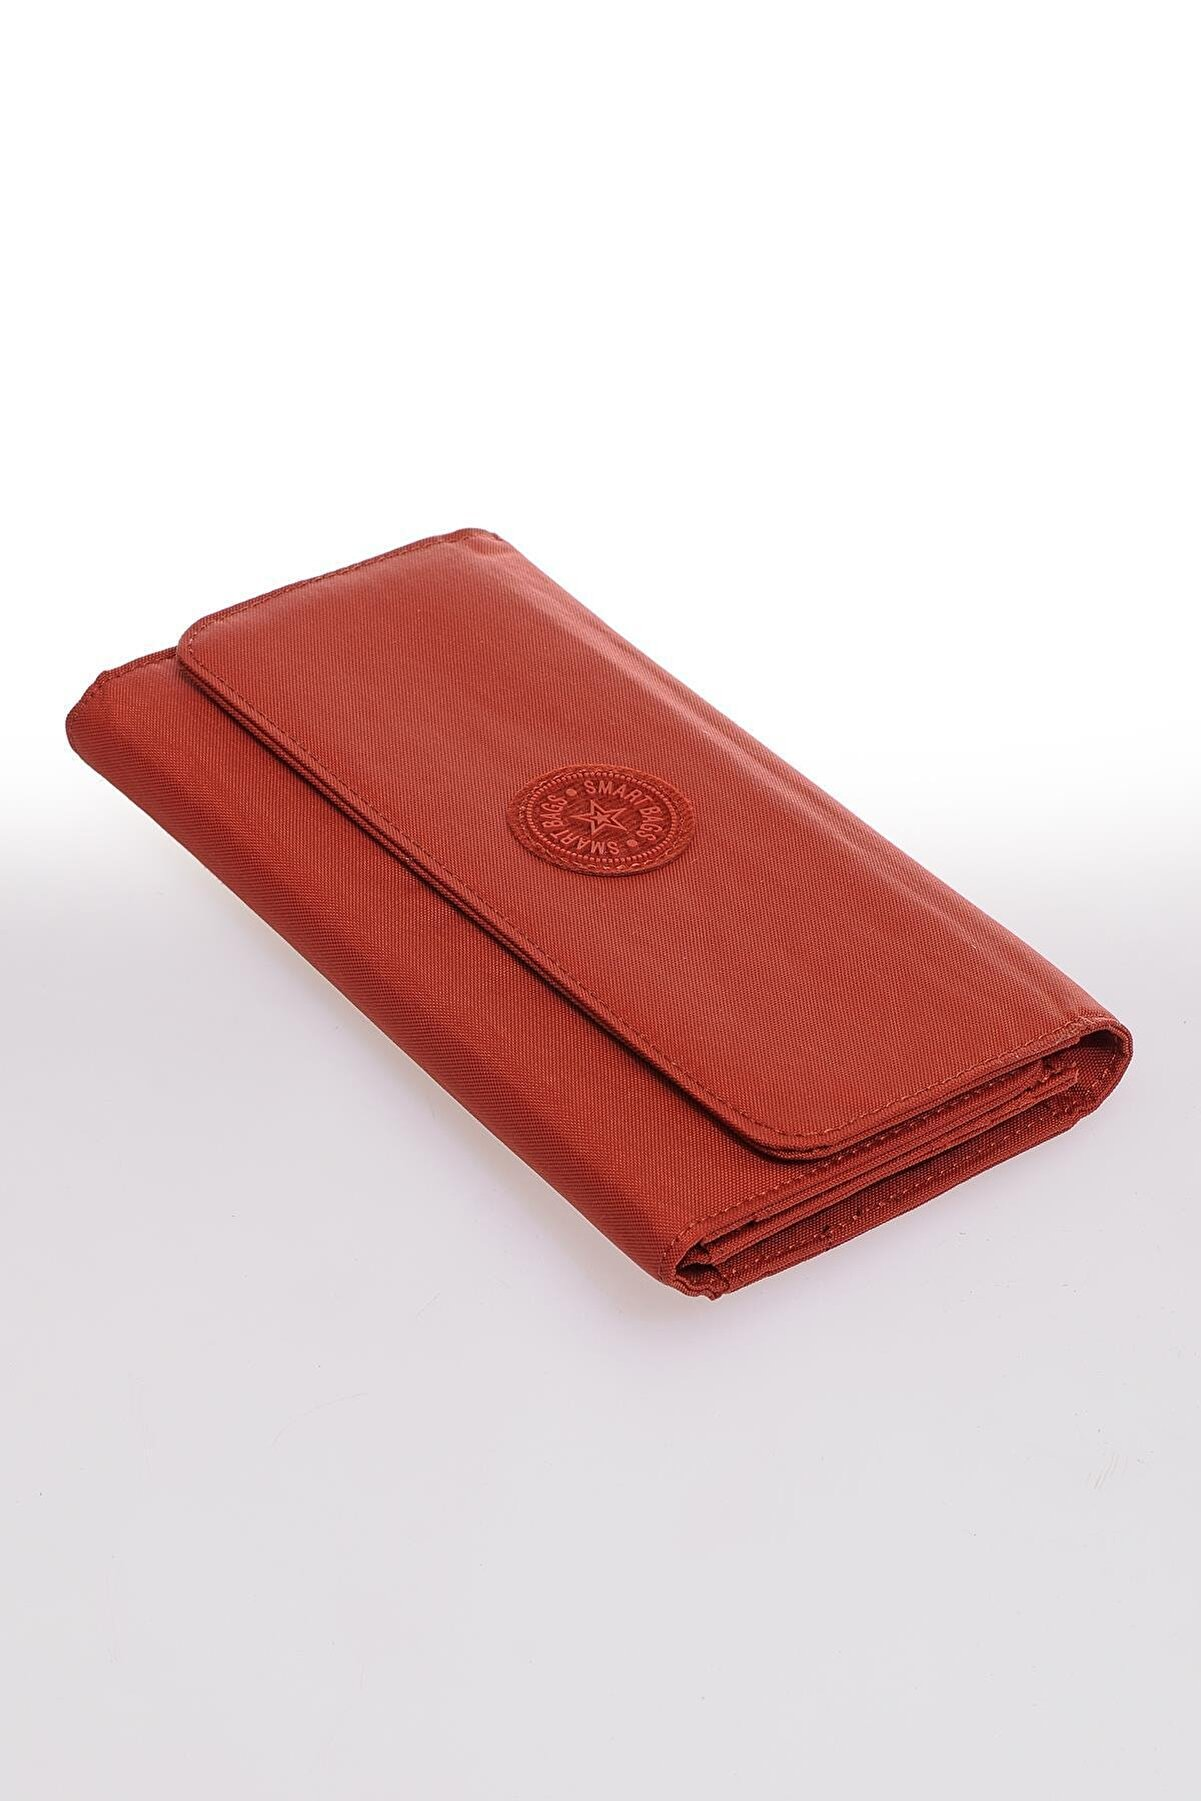 Smart Bags Smb1225-0128 Kiremit Kadın Cüzdan